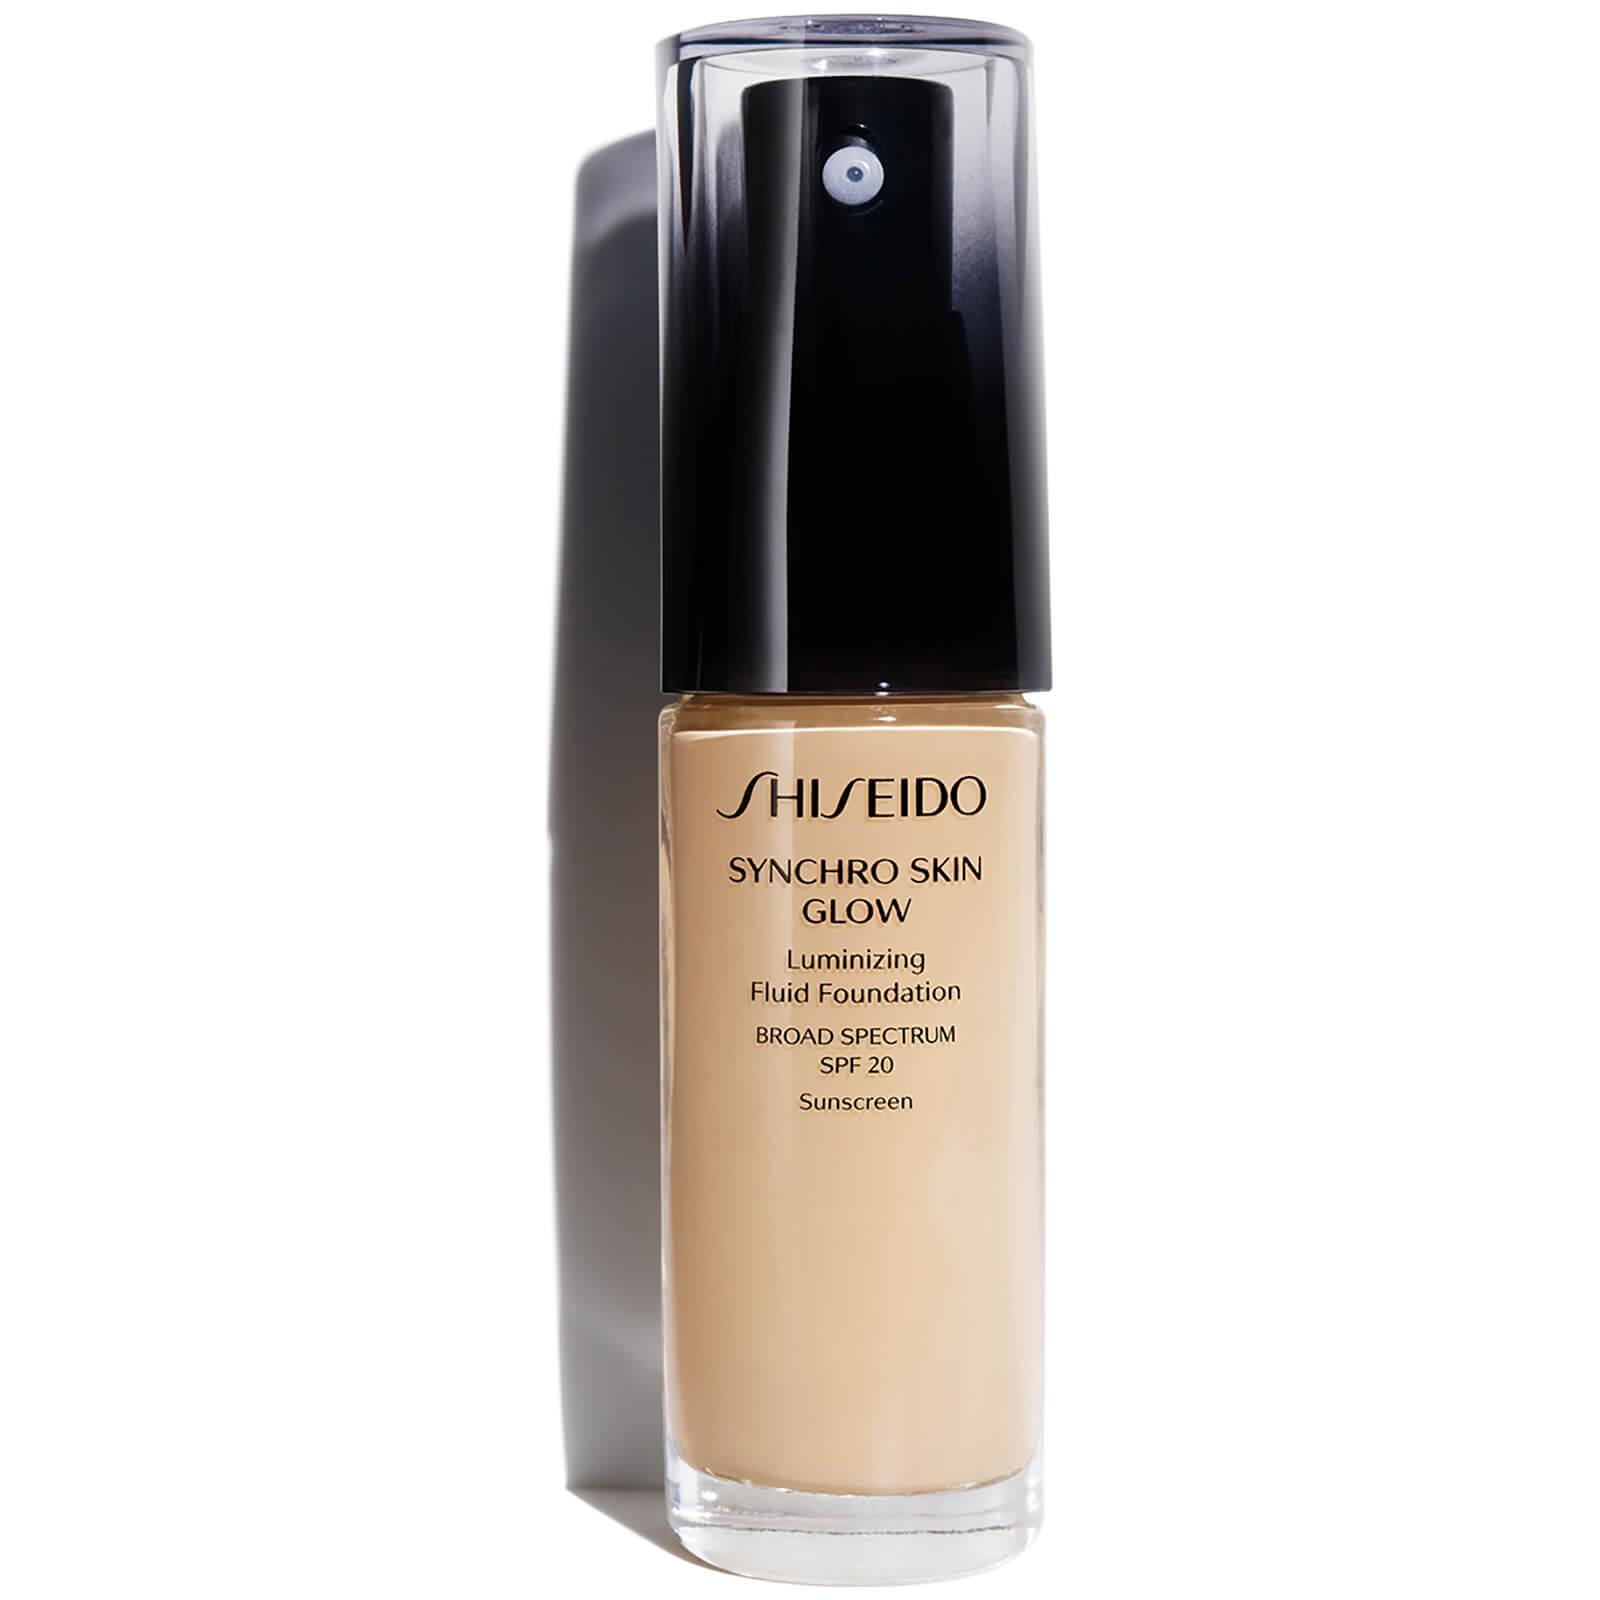 Shiseido Synchro Skin Glow Luminizing Foundation 30 ml (varie tonalità) - Golden 3